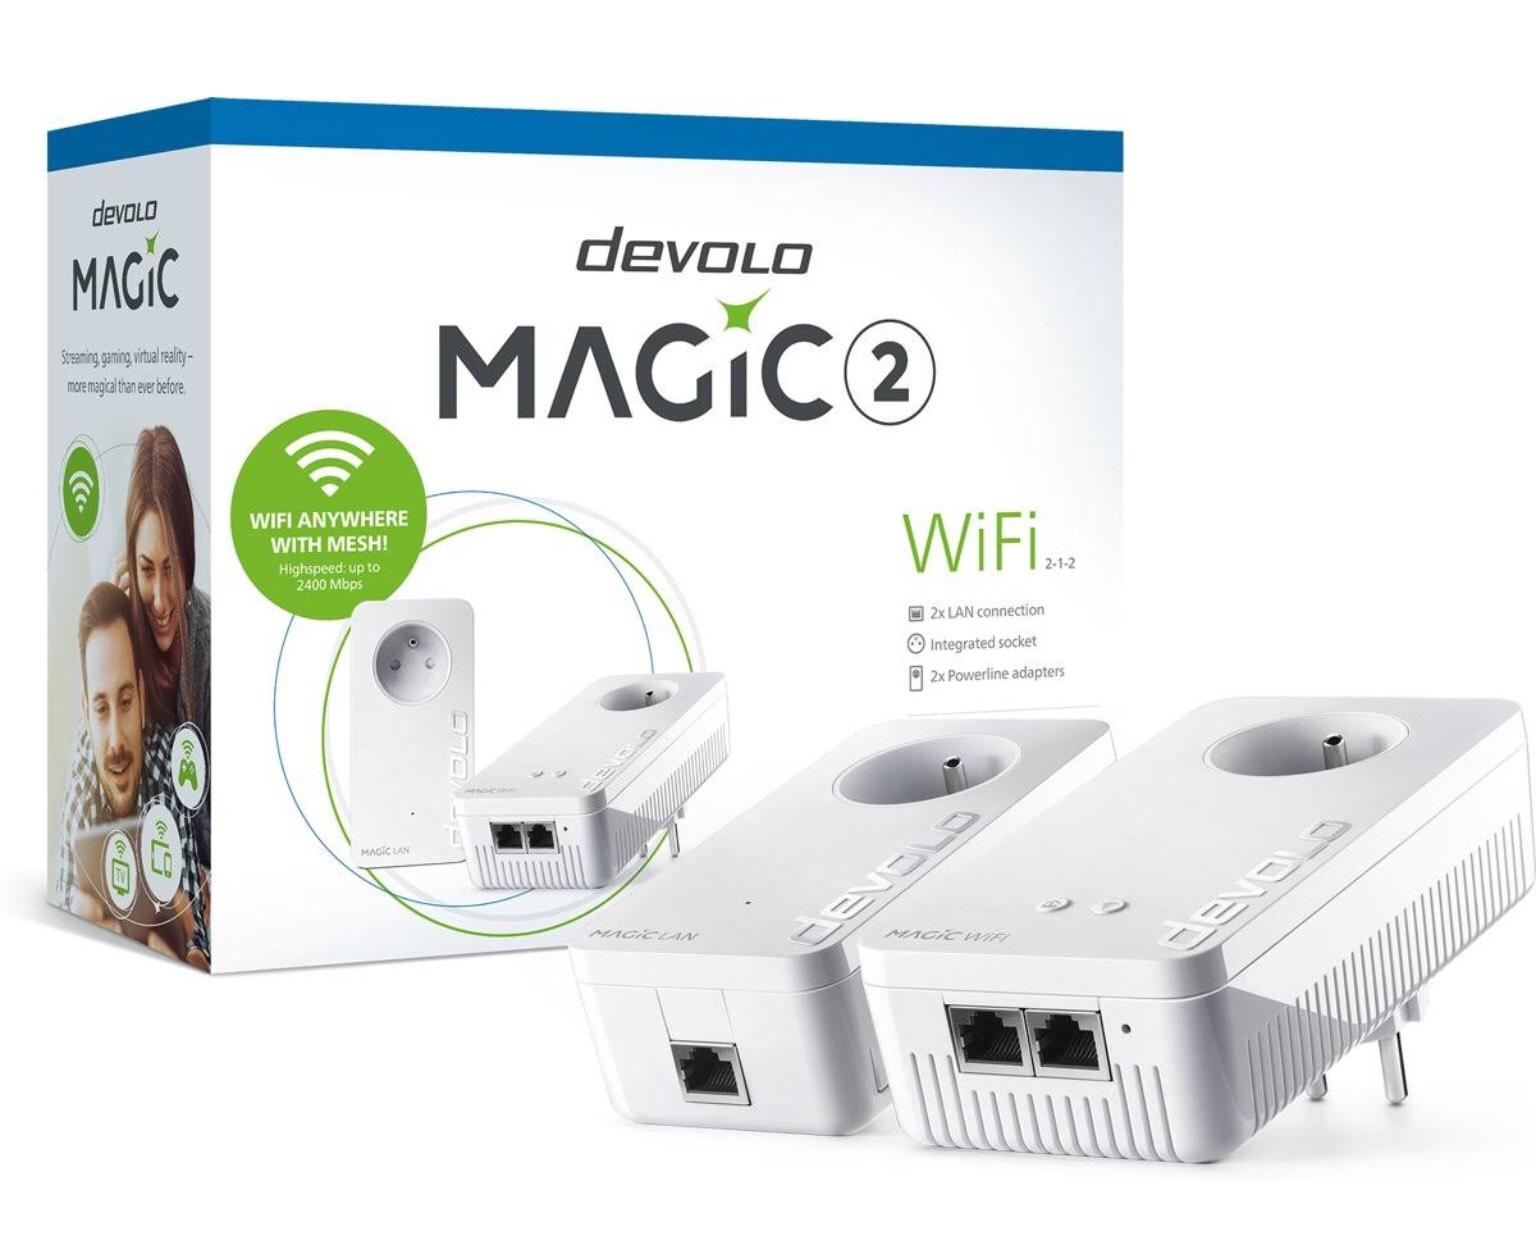 Devolo magic 2 powerline adapter